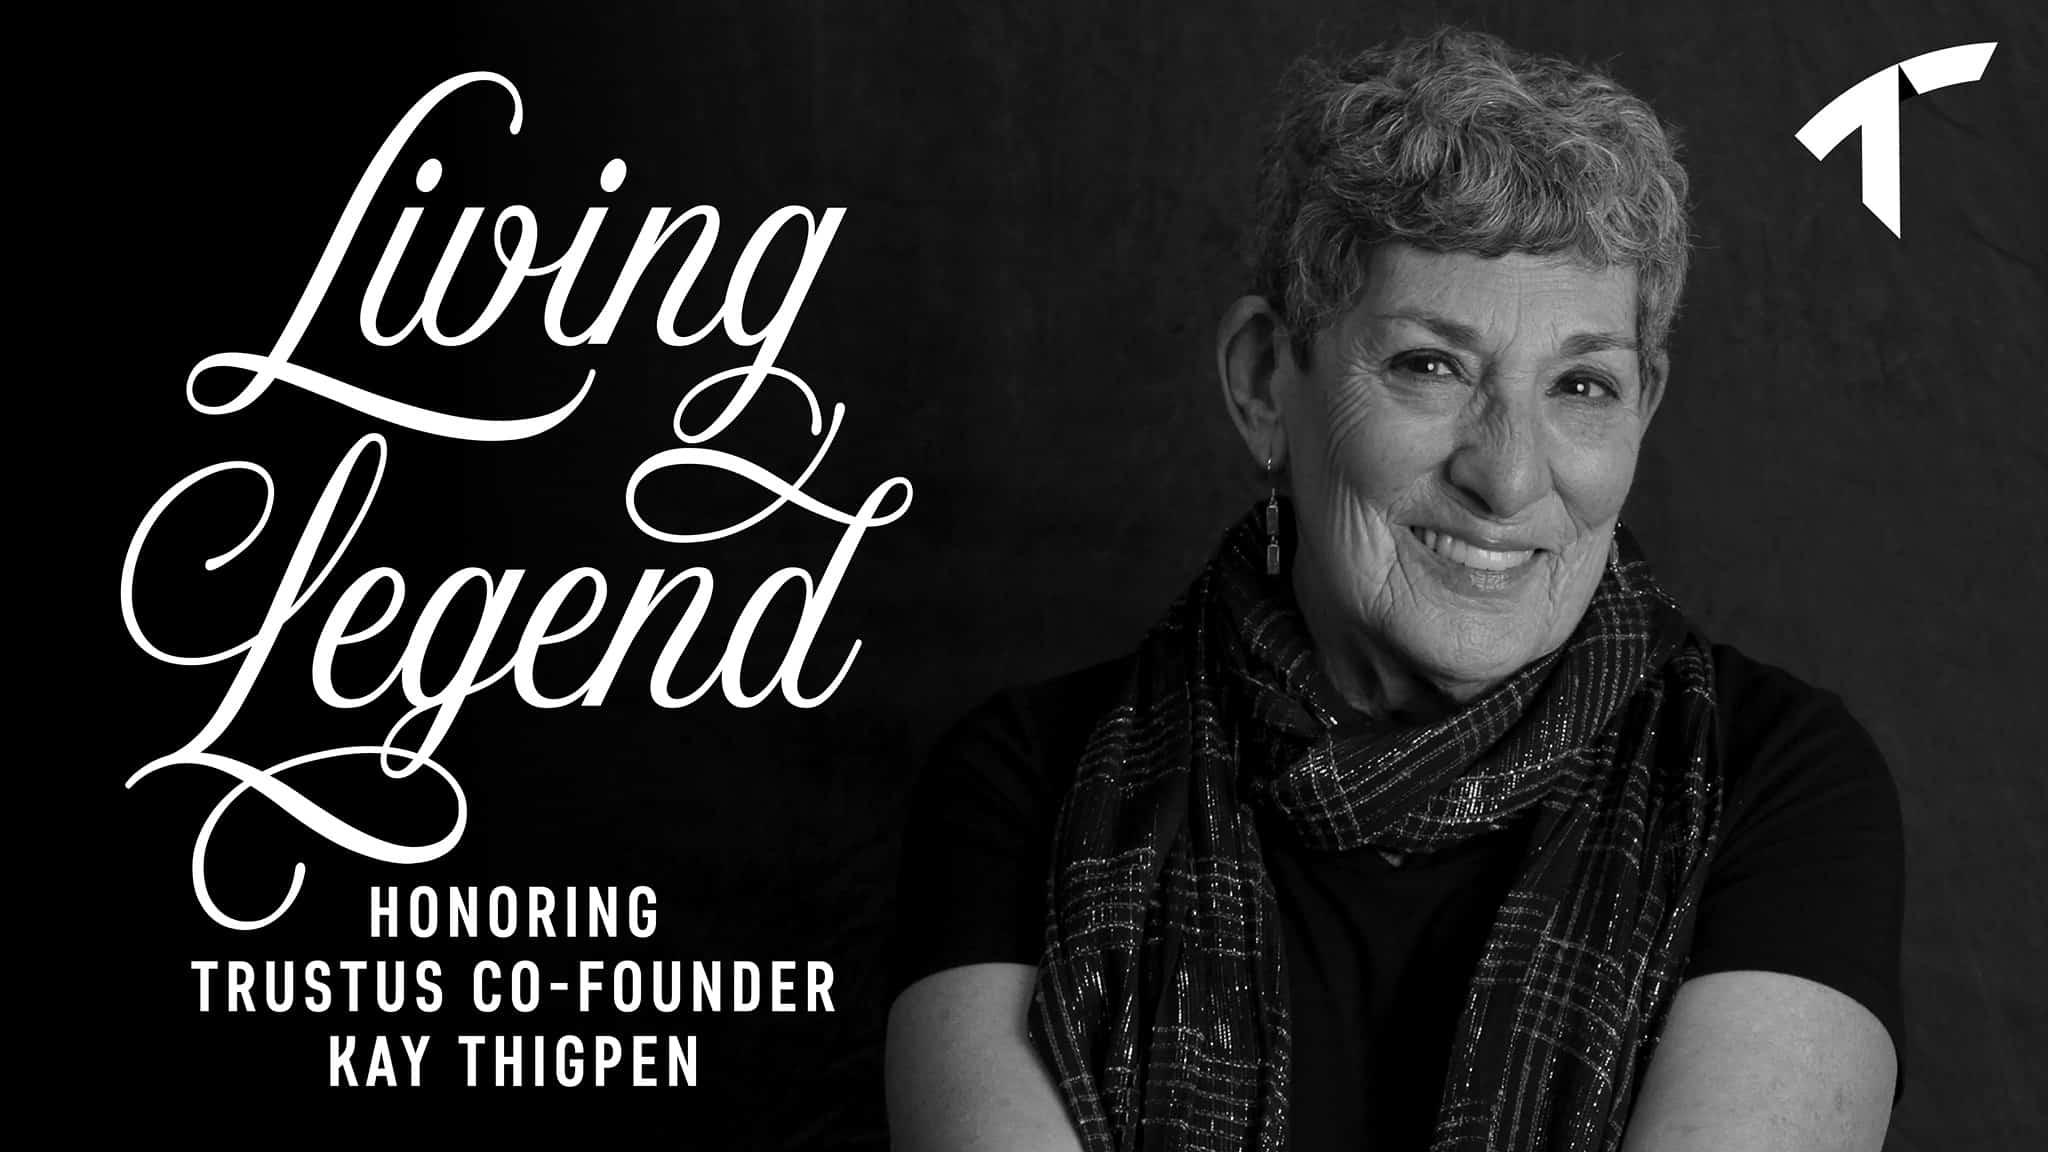 Living Legend 2019: Kay Thigpen